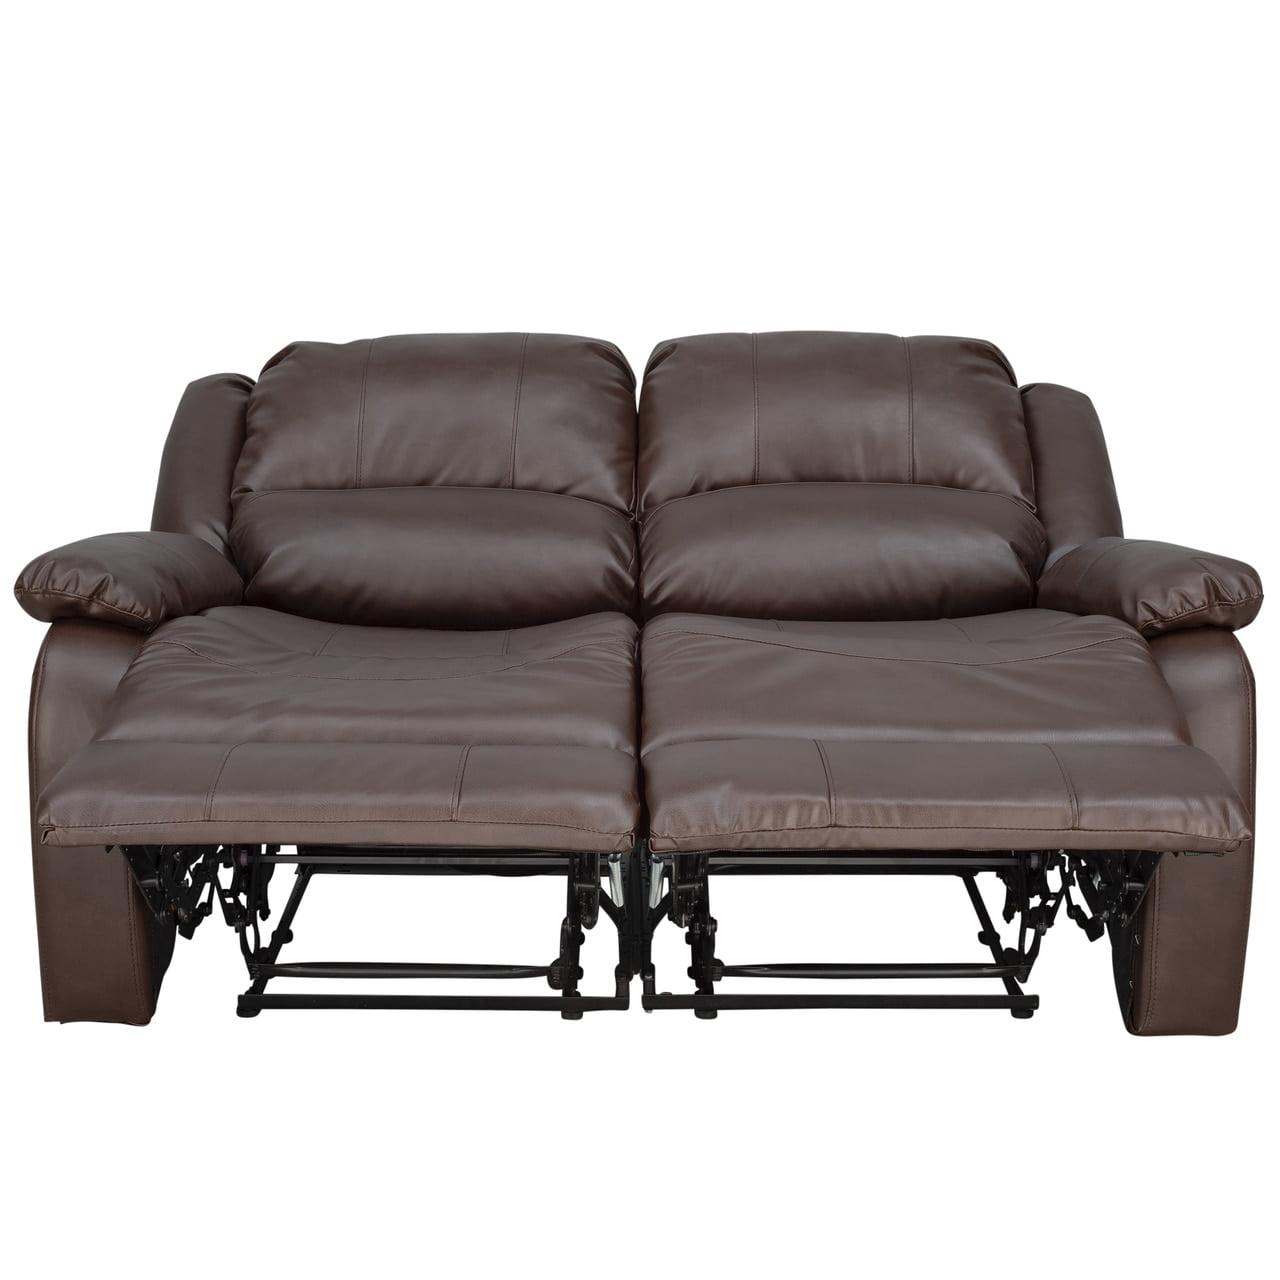 Groovy Recpro Charles 58 Double Rv Wall Hugger Recliner Sofa Rv Beatyapartments Chair Design Images Beatyapartmentscom